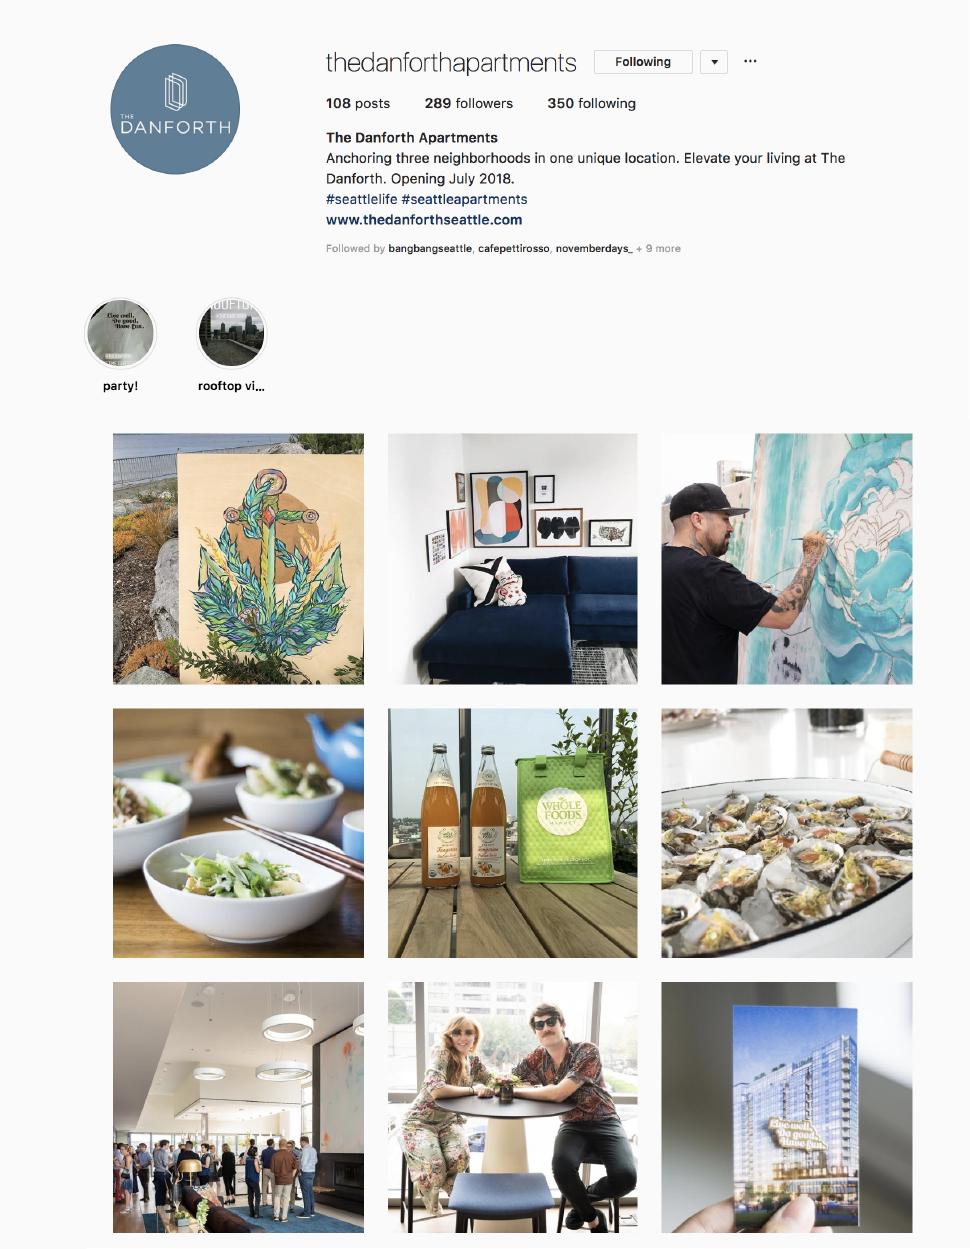 The Danforth Seattle Instagram